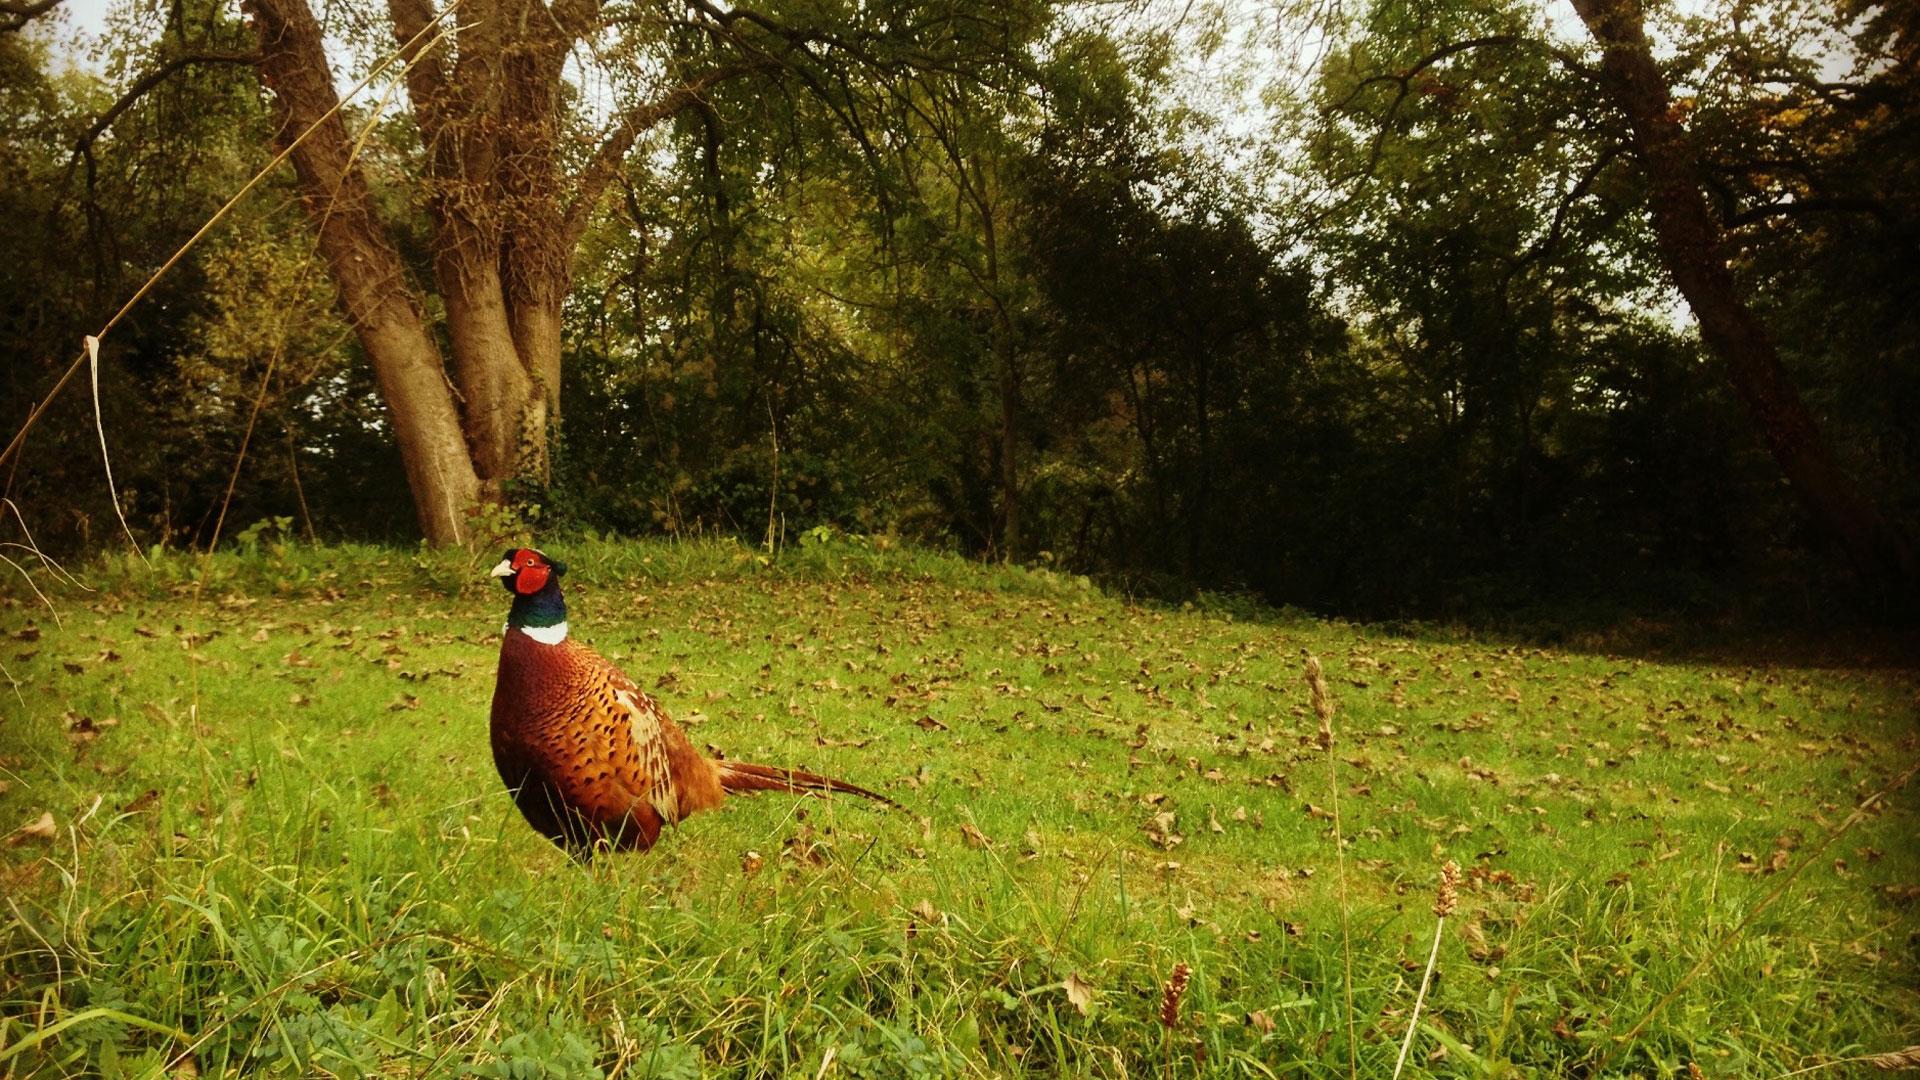 The Friendly Pheasant